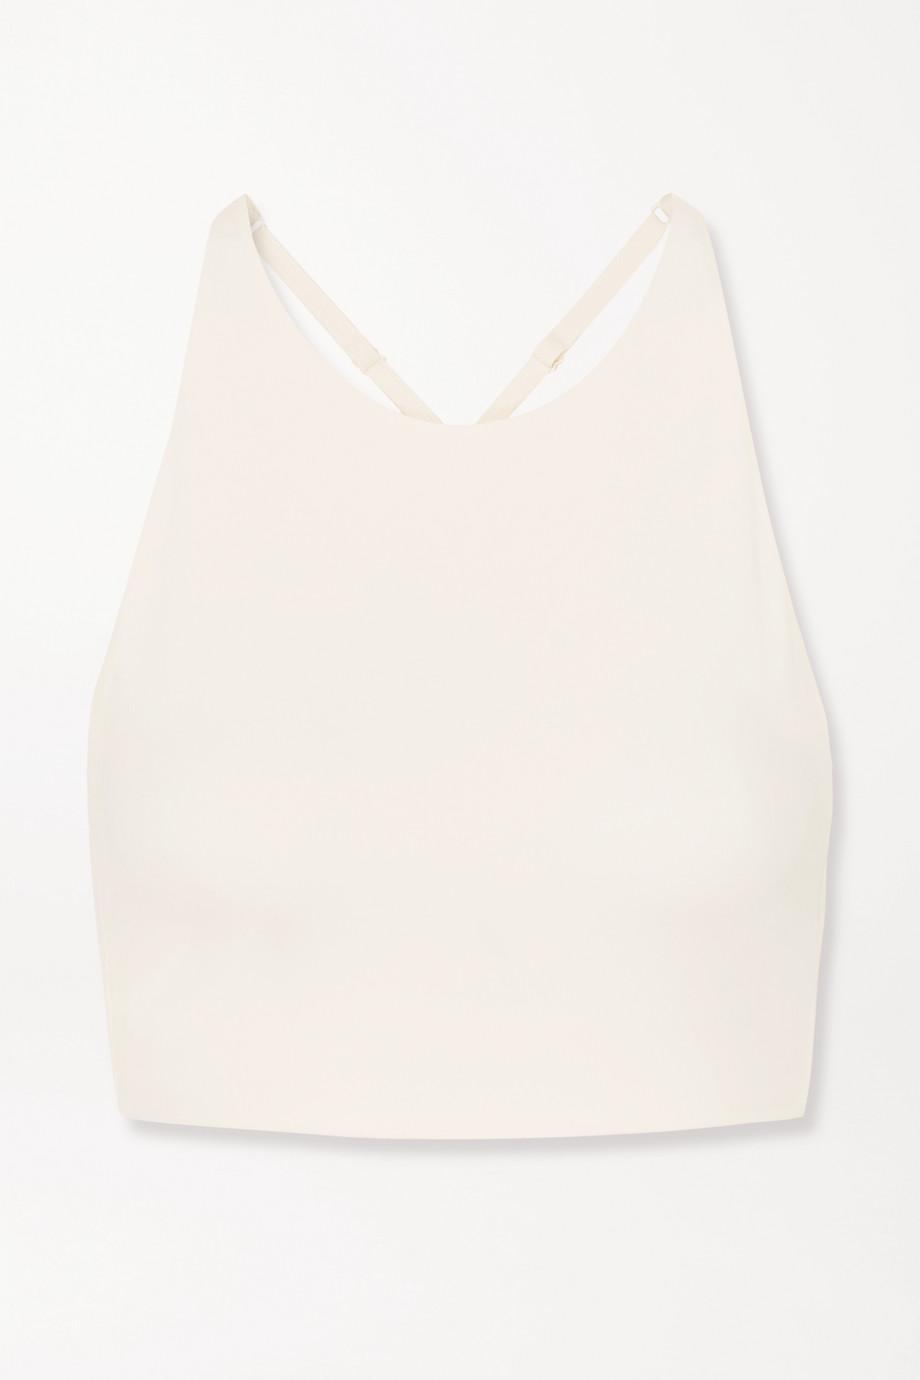 Girlfriend Collective Topanga stretch sports bra